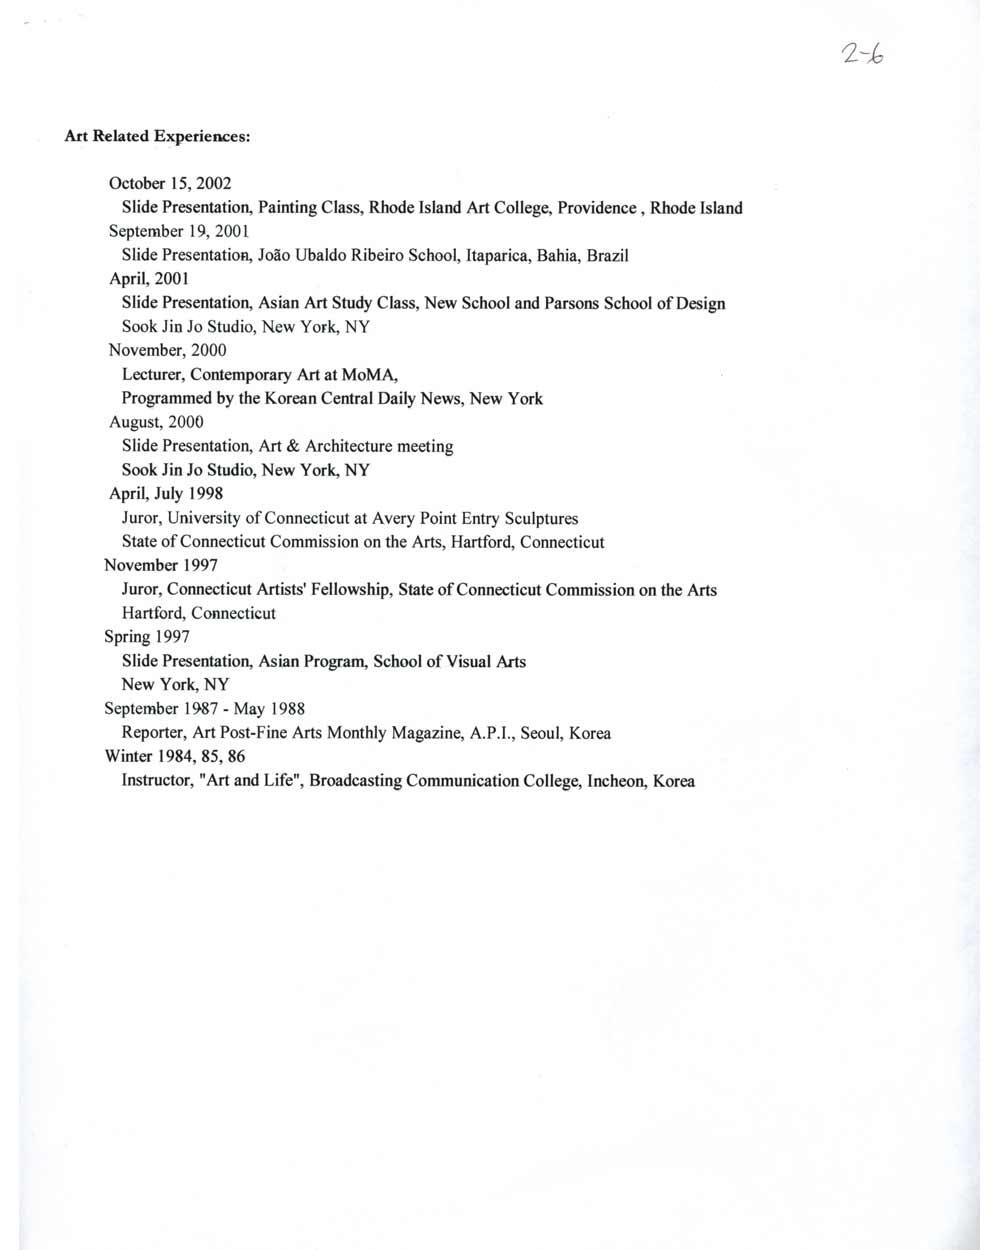 Sook Jin Jo's resume, pg 6